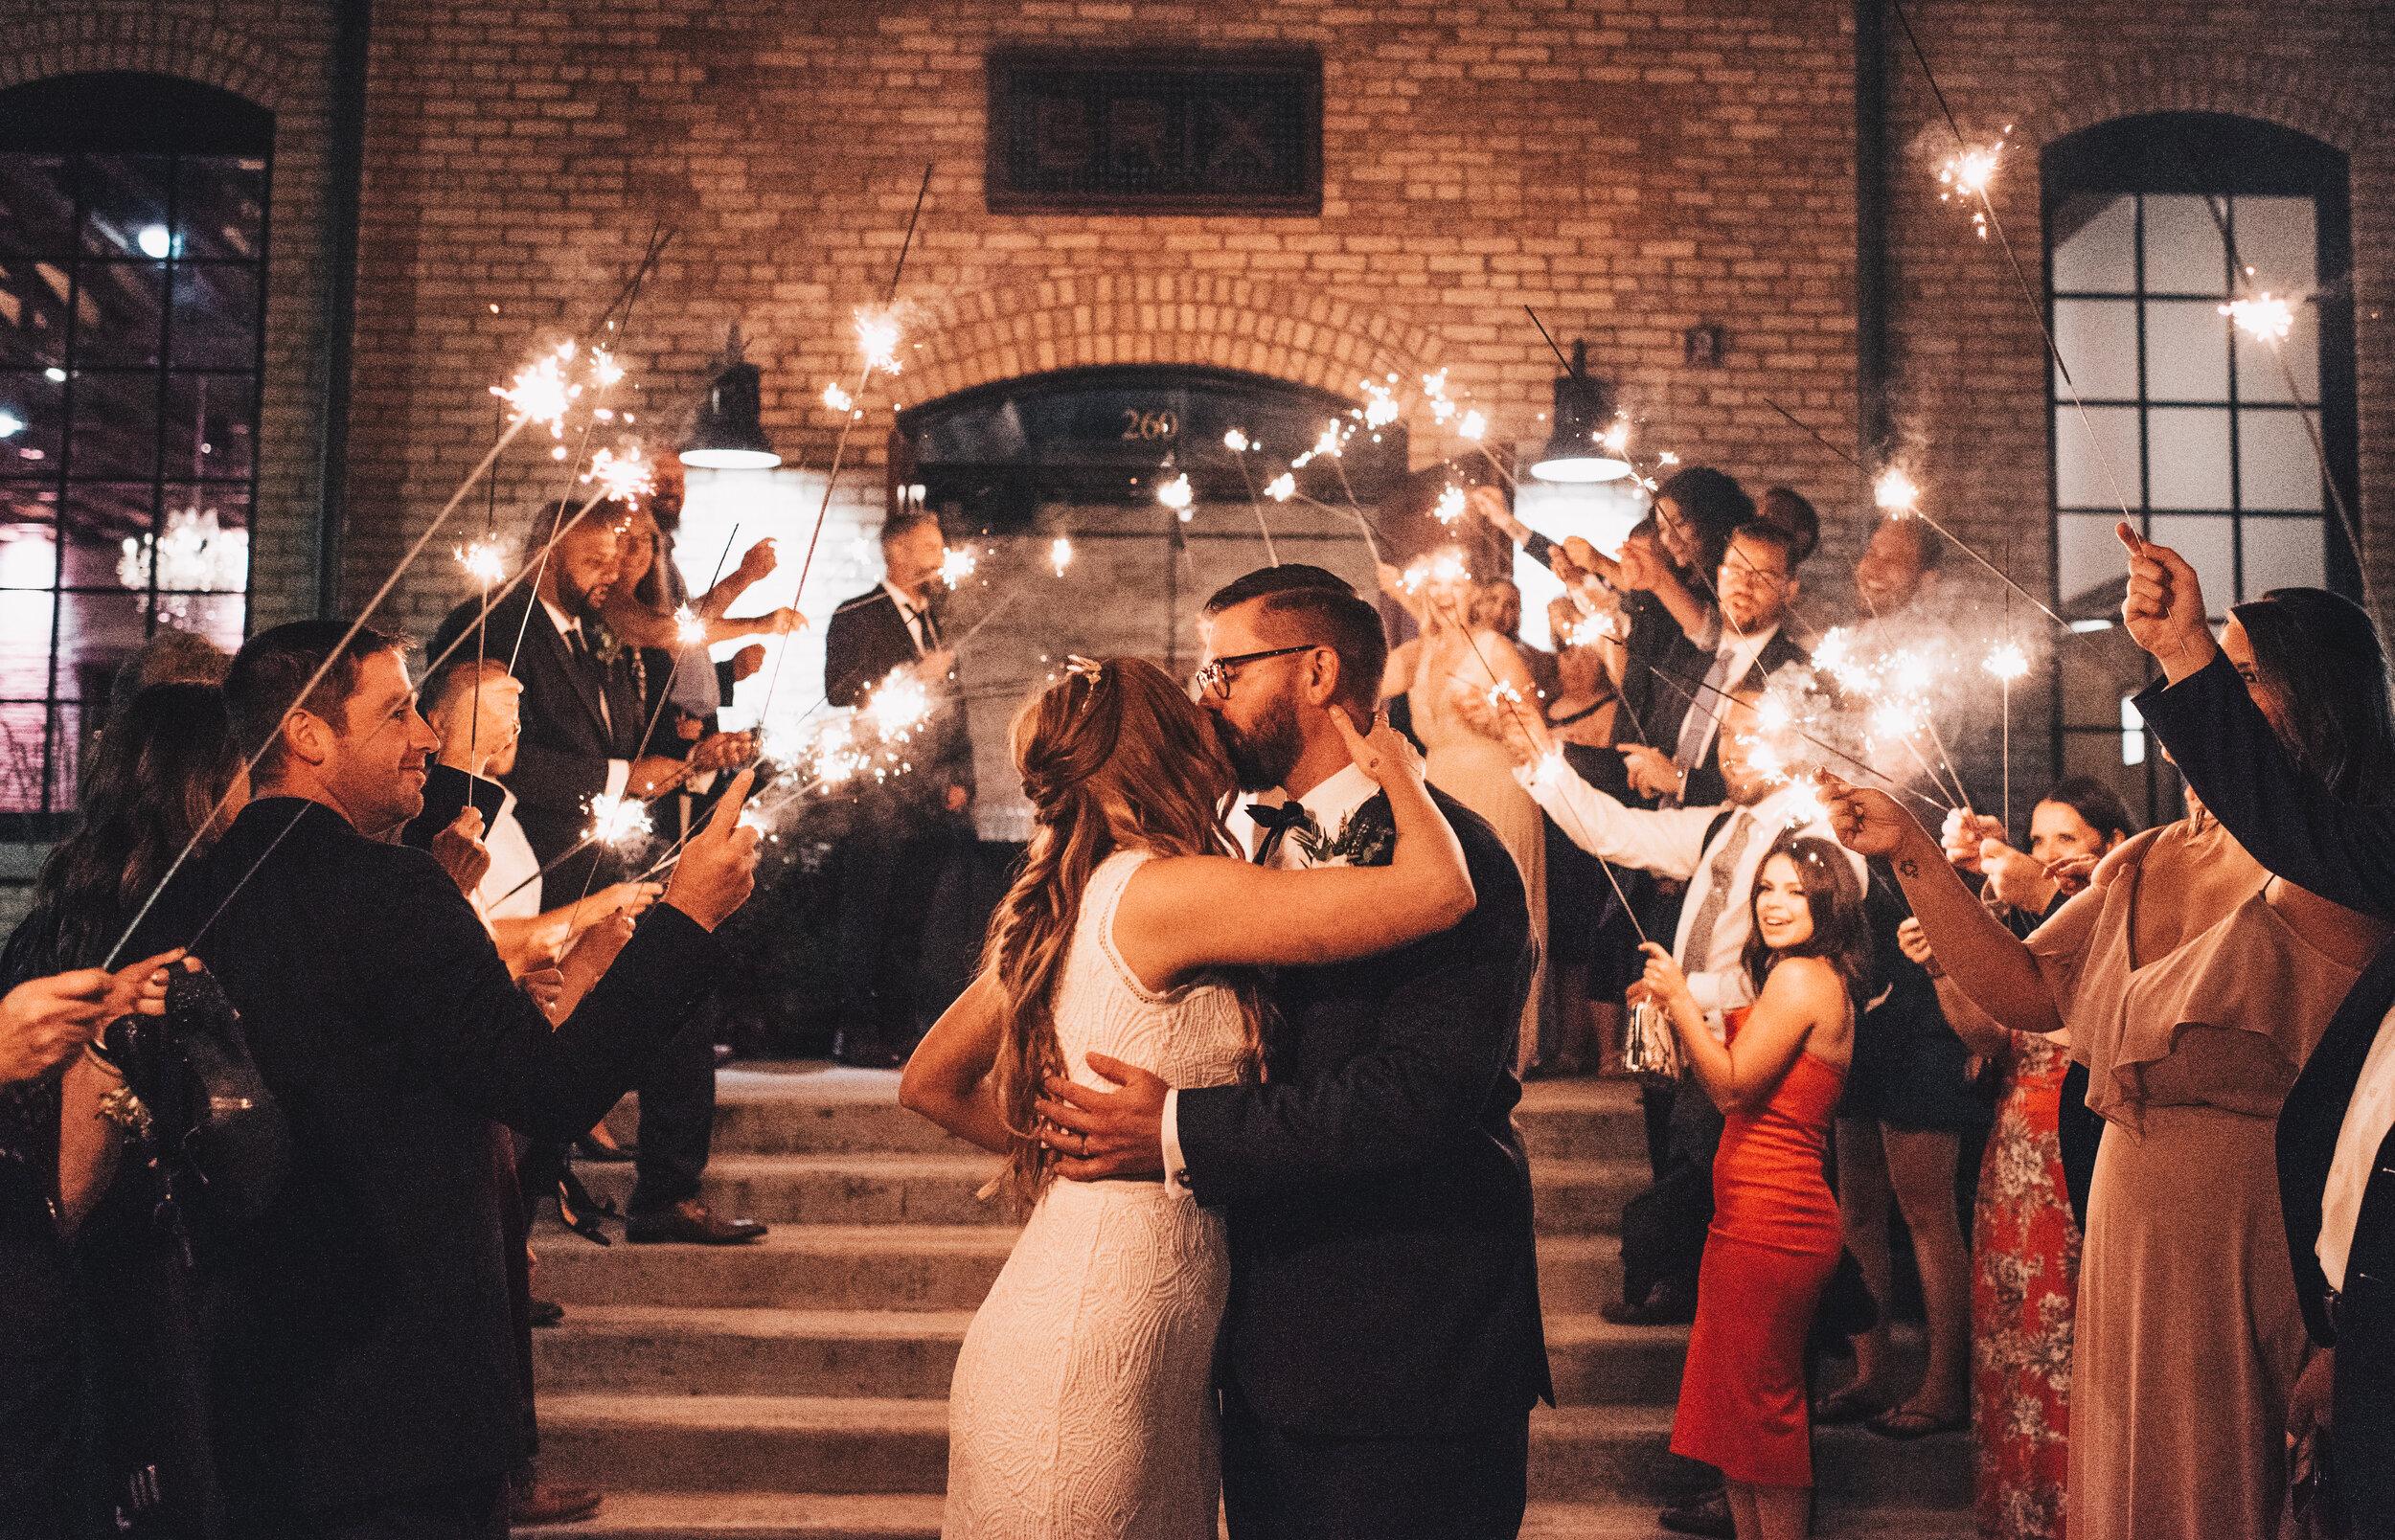 Modern Industrial Wedding, The Brix on the Fox, The BRIX, Chicago Industrial Wedding, Modern Midwest Wedding, The Brix on the Fox Wedding, The BRIX Wedding, Wedding Sparkler Exit Photos